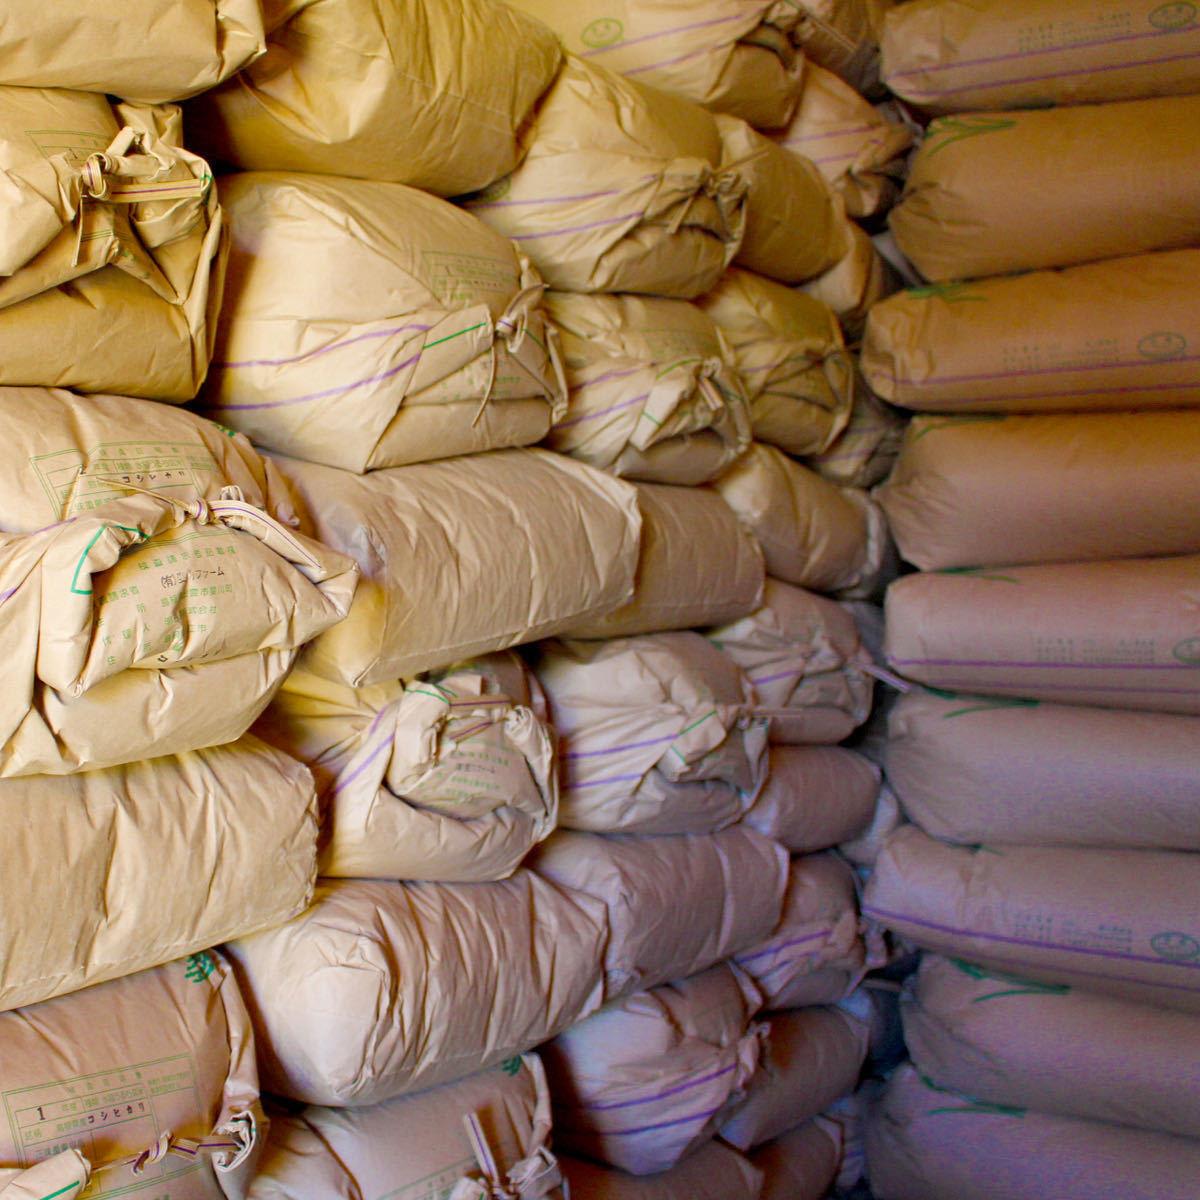 G065【送料無料】玄米 中米 令和2年産 1.89~1.80mm 約24~25kg 色選済 ハナエチゼン・コシヒカリ・つや姫・きぬむすめ 島根県産 2020年産_画像6